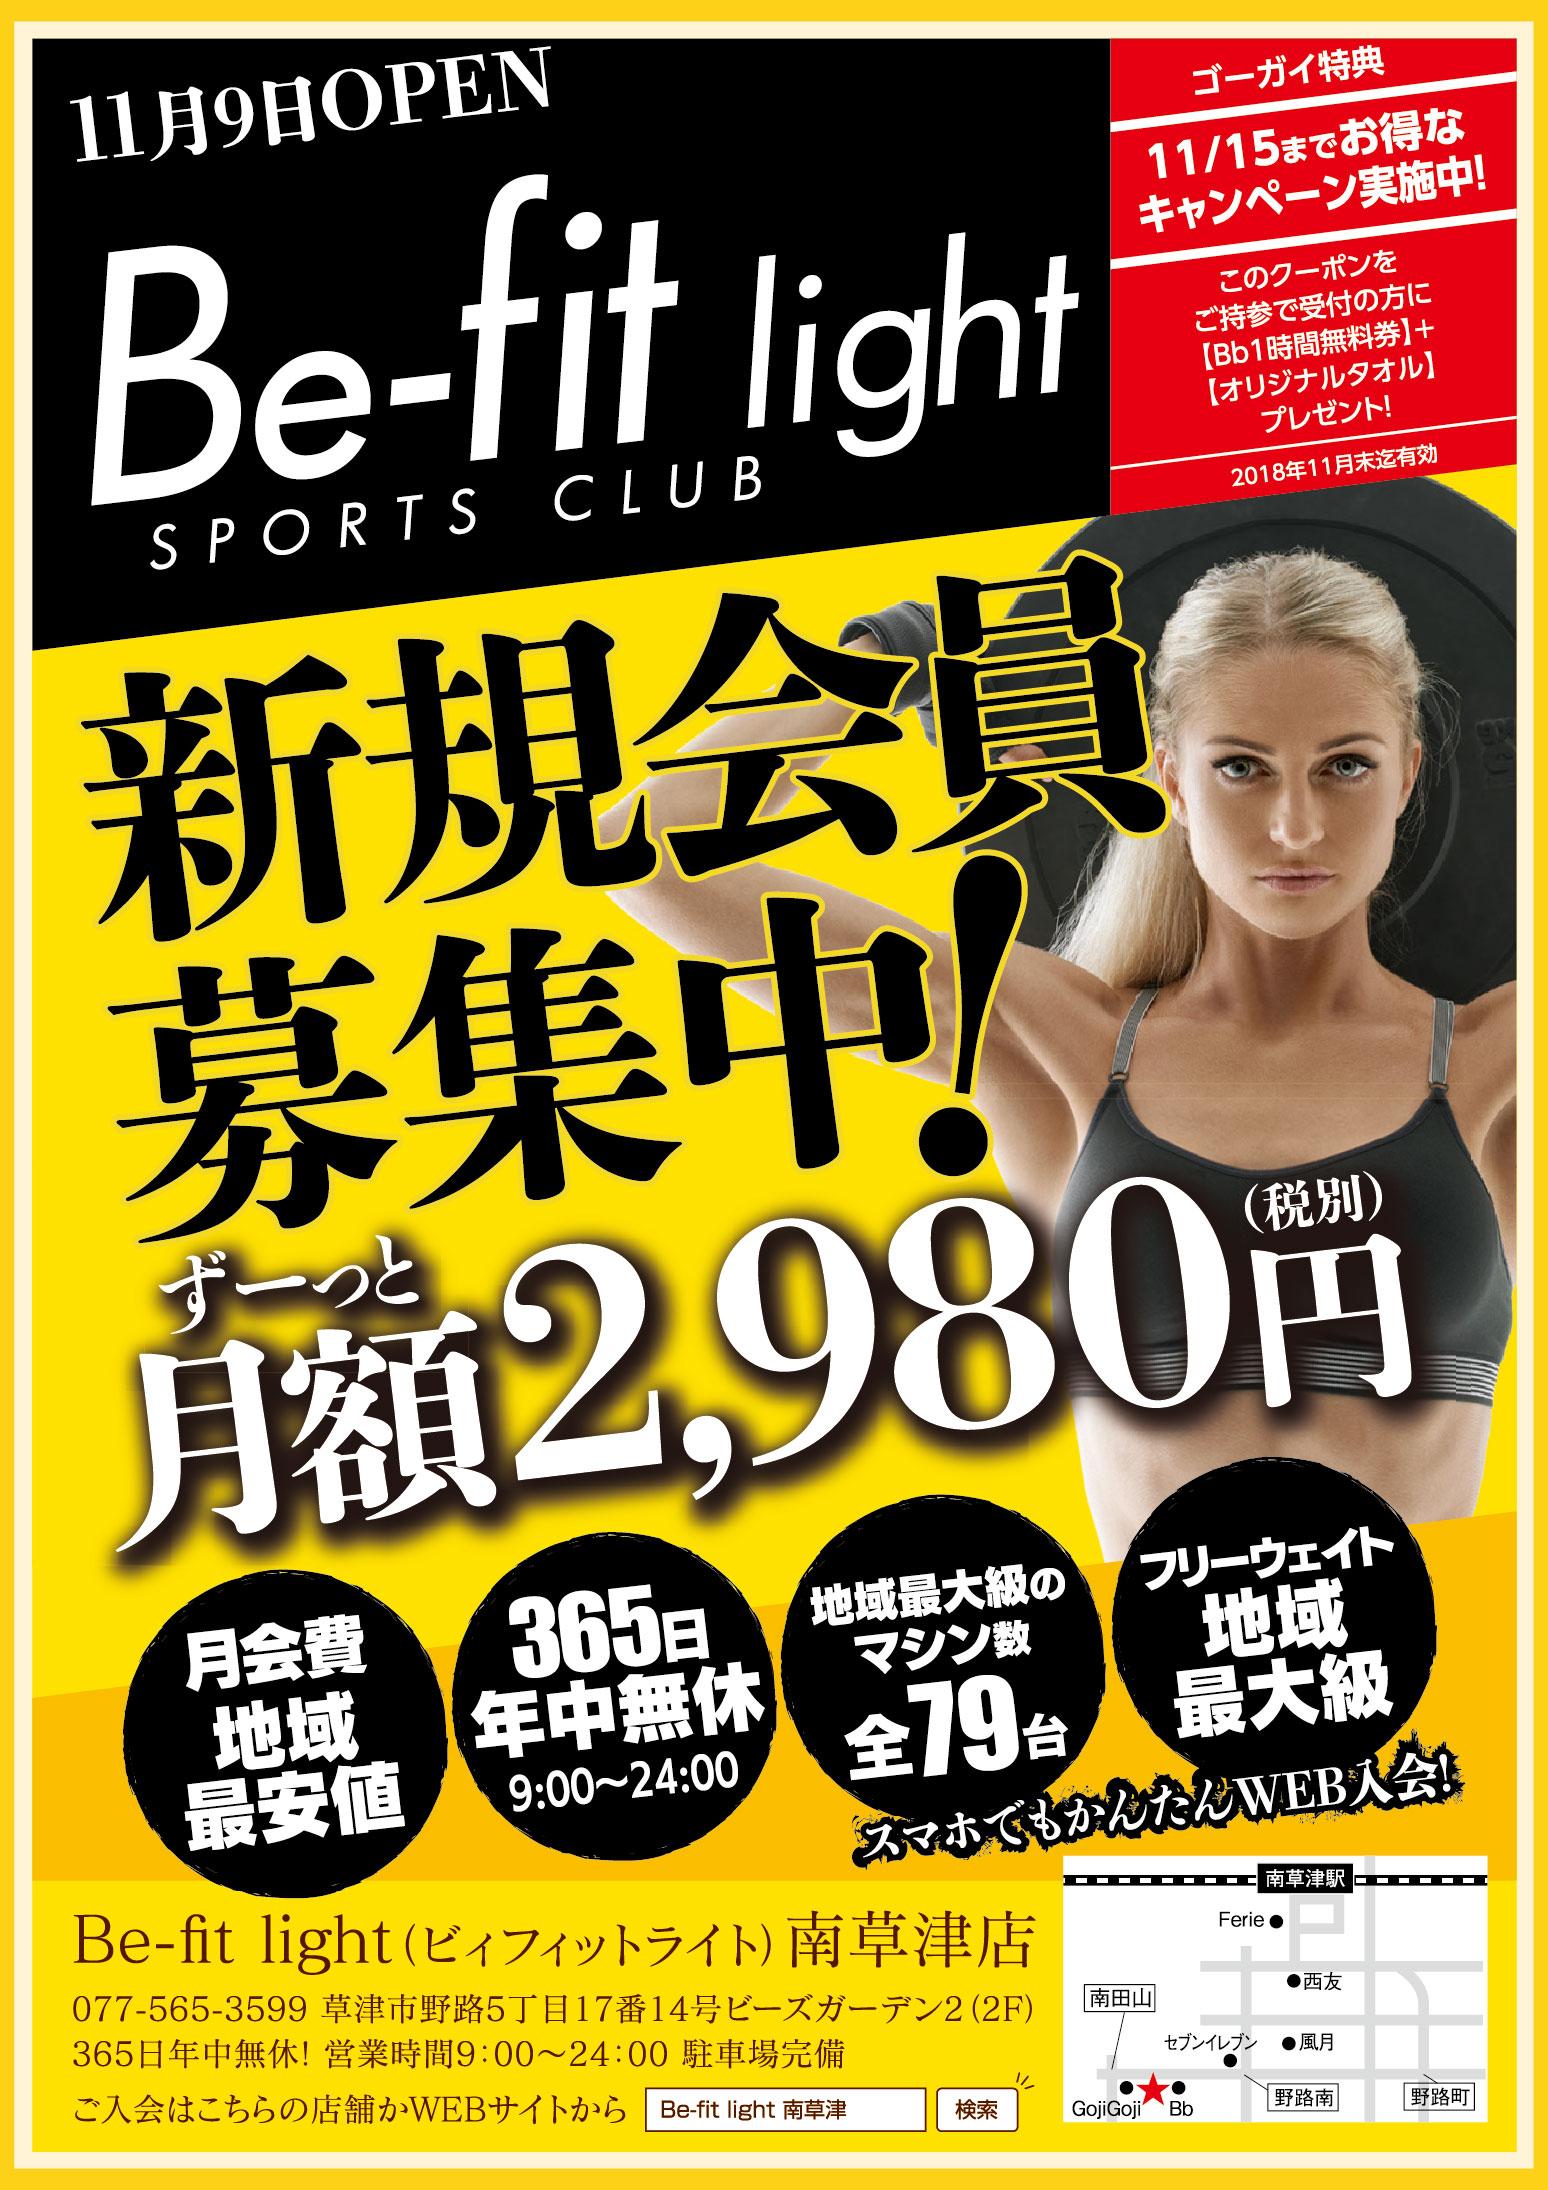 Be-fit light(ビィフィットライト) 南草津店